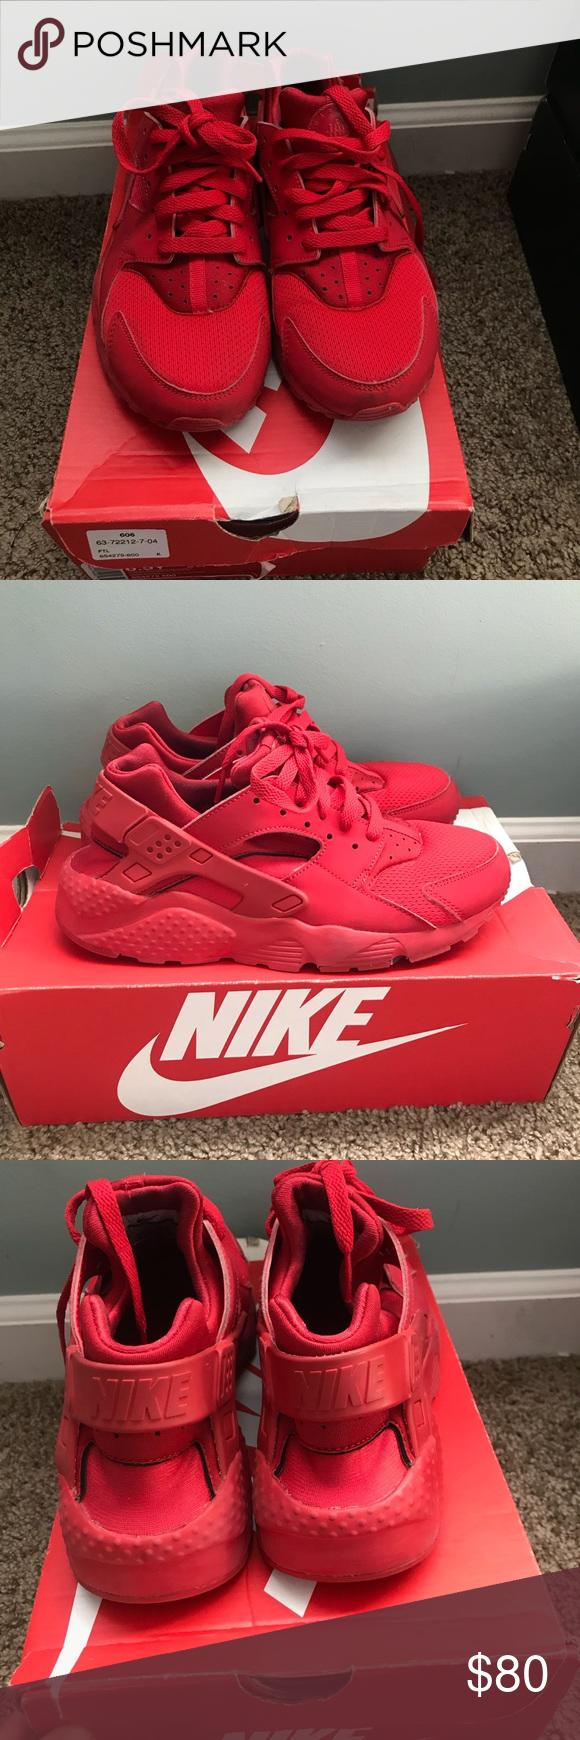 47cbb87b57ea Nike Huarache Run (Triple Red) Runs small! Fits size 7 in women s and size  5.5 in kids! Nike Shoes Sneakers